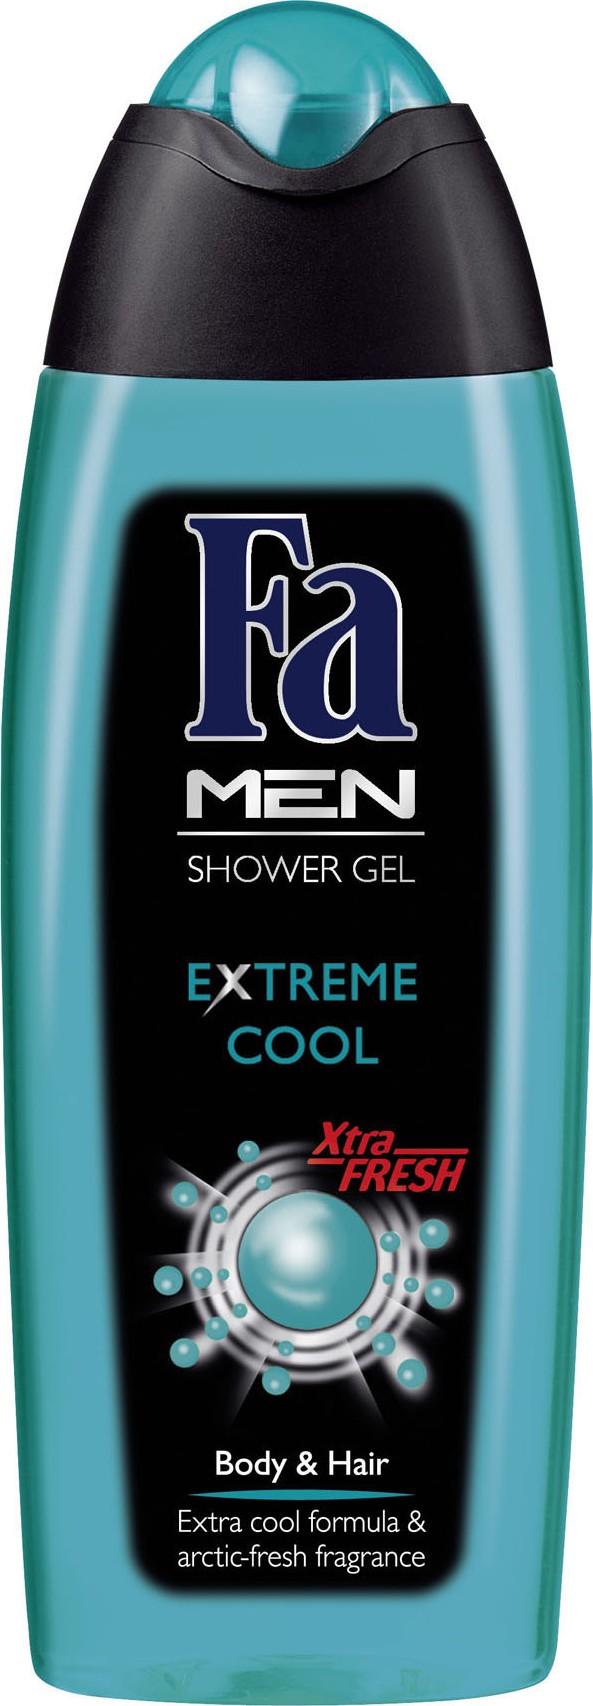 Fotografie Fa Men Extreme Cool sprchový gel pro muže 250 ml